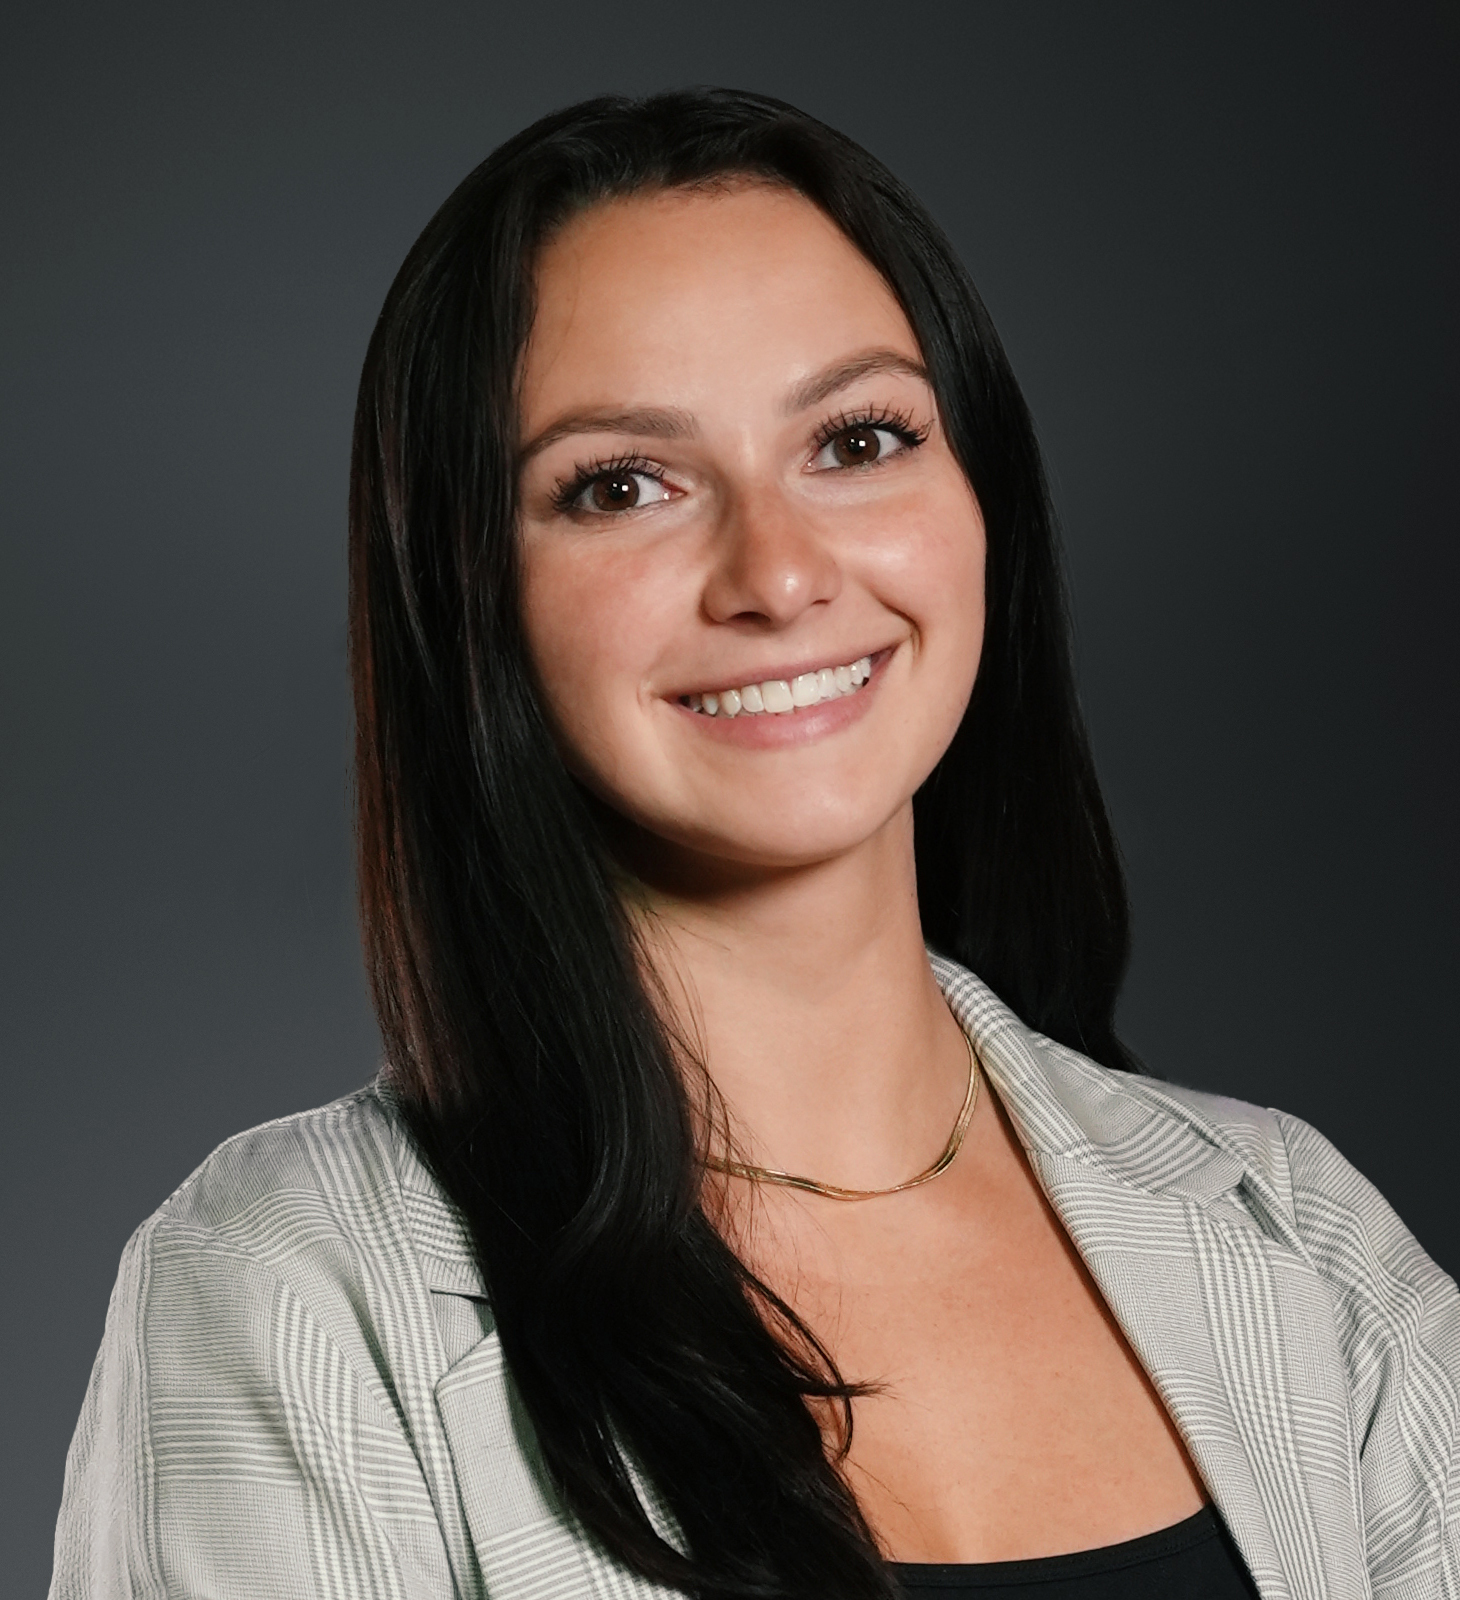 Morgan Holycross Headshot | Dakota Investments